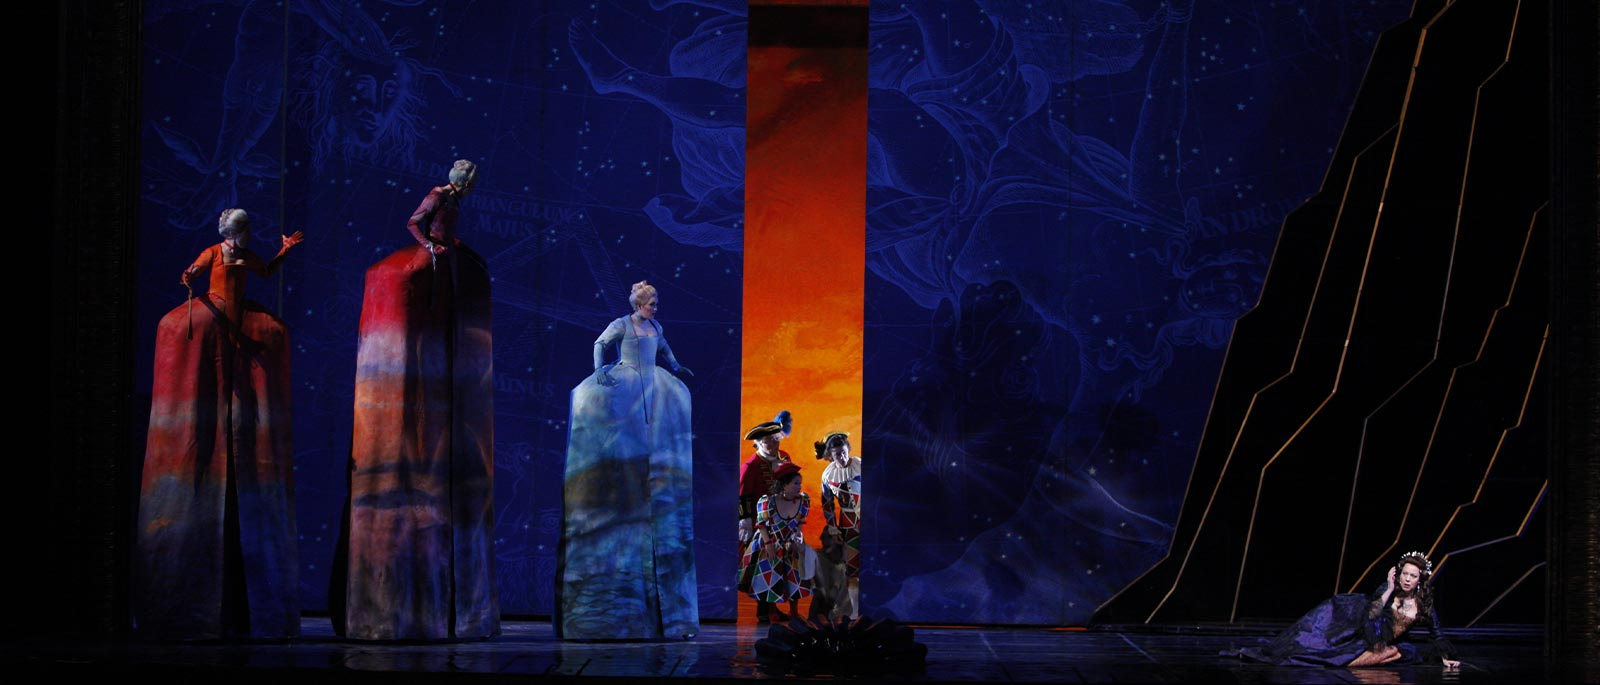 Met Opera: Ariadne auf Naxos